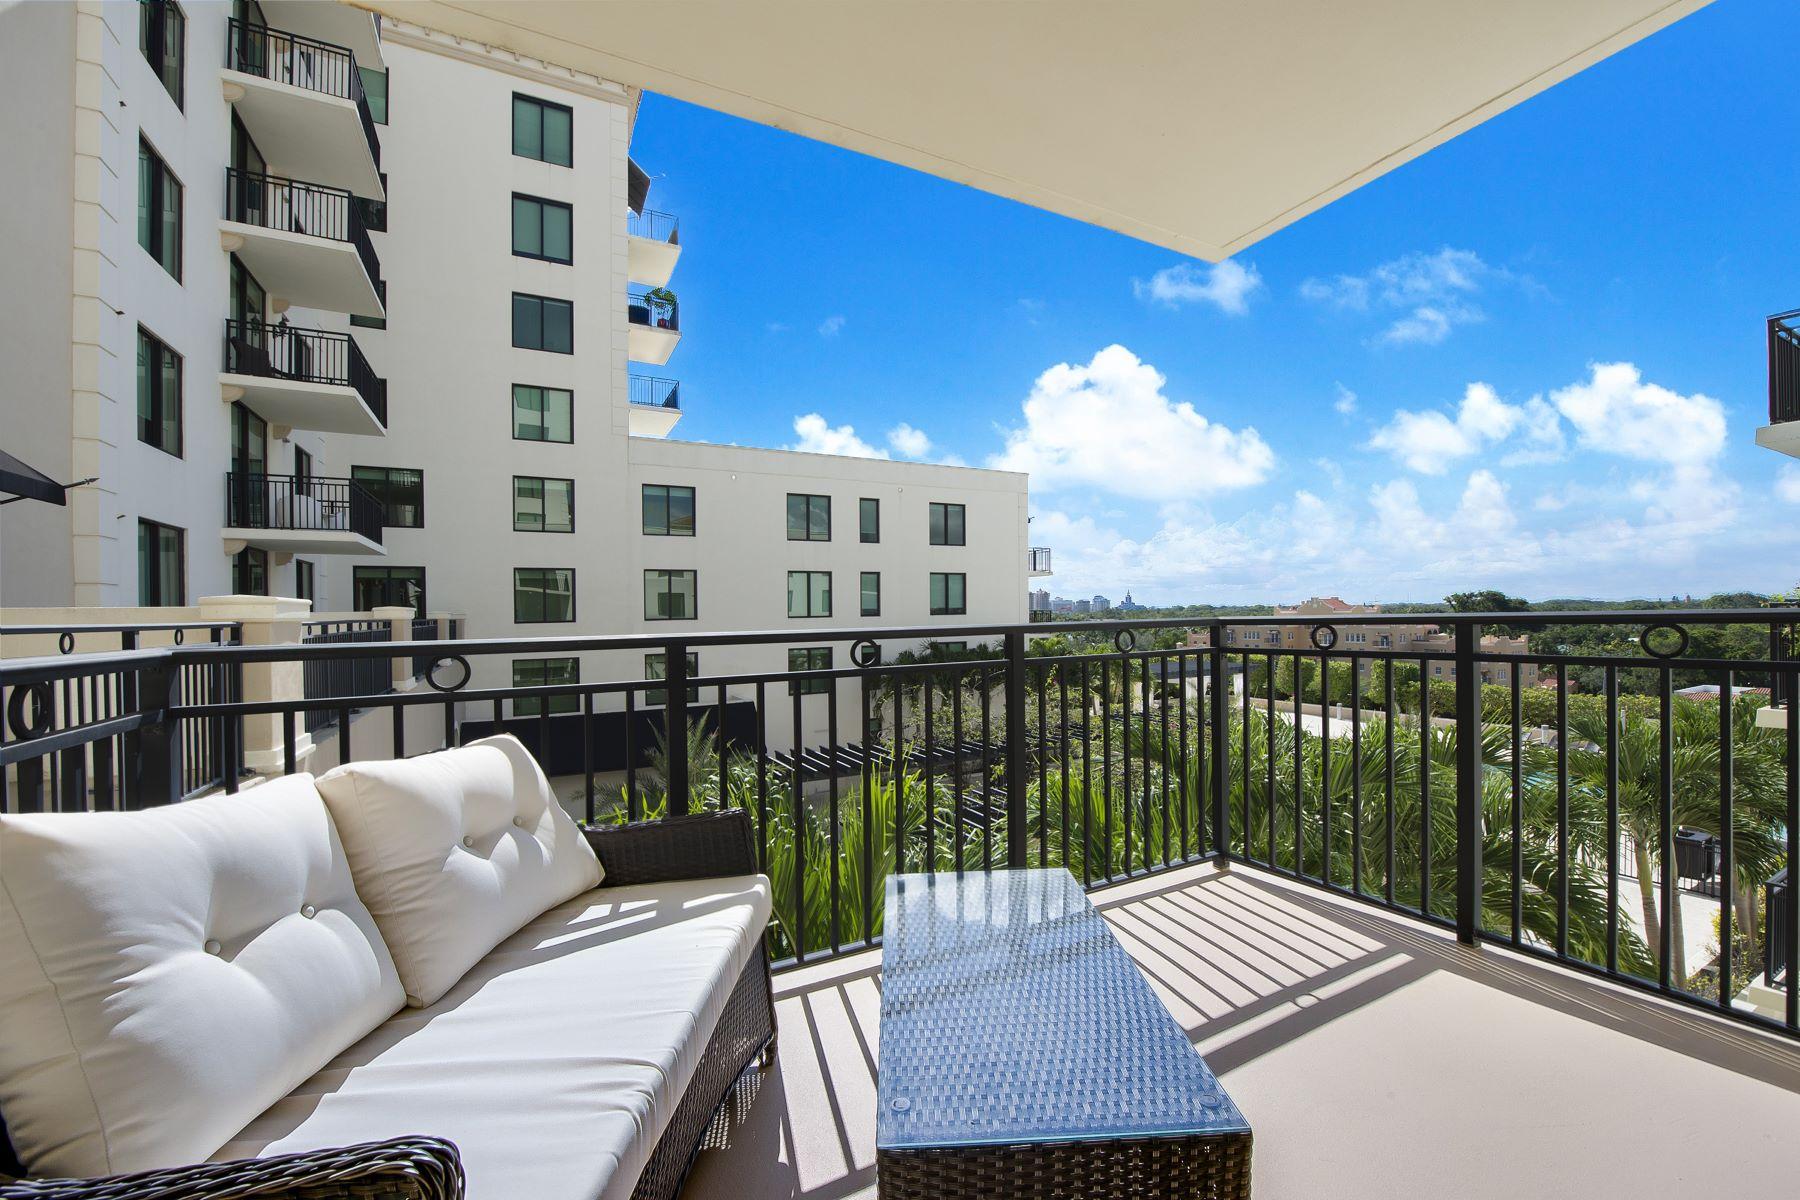 Condominium for Sale at 1300 Ponce De Leon Blvd 1300 Ponce De Leon Blvd 714, Coral Gables, Florida, 33134 United States